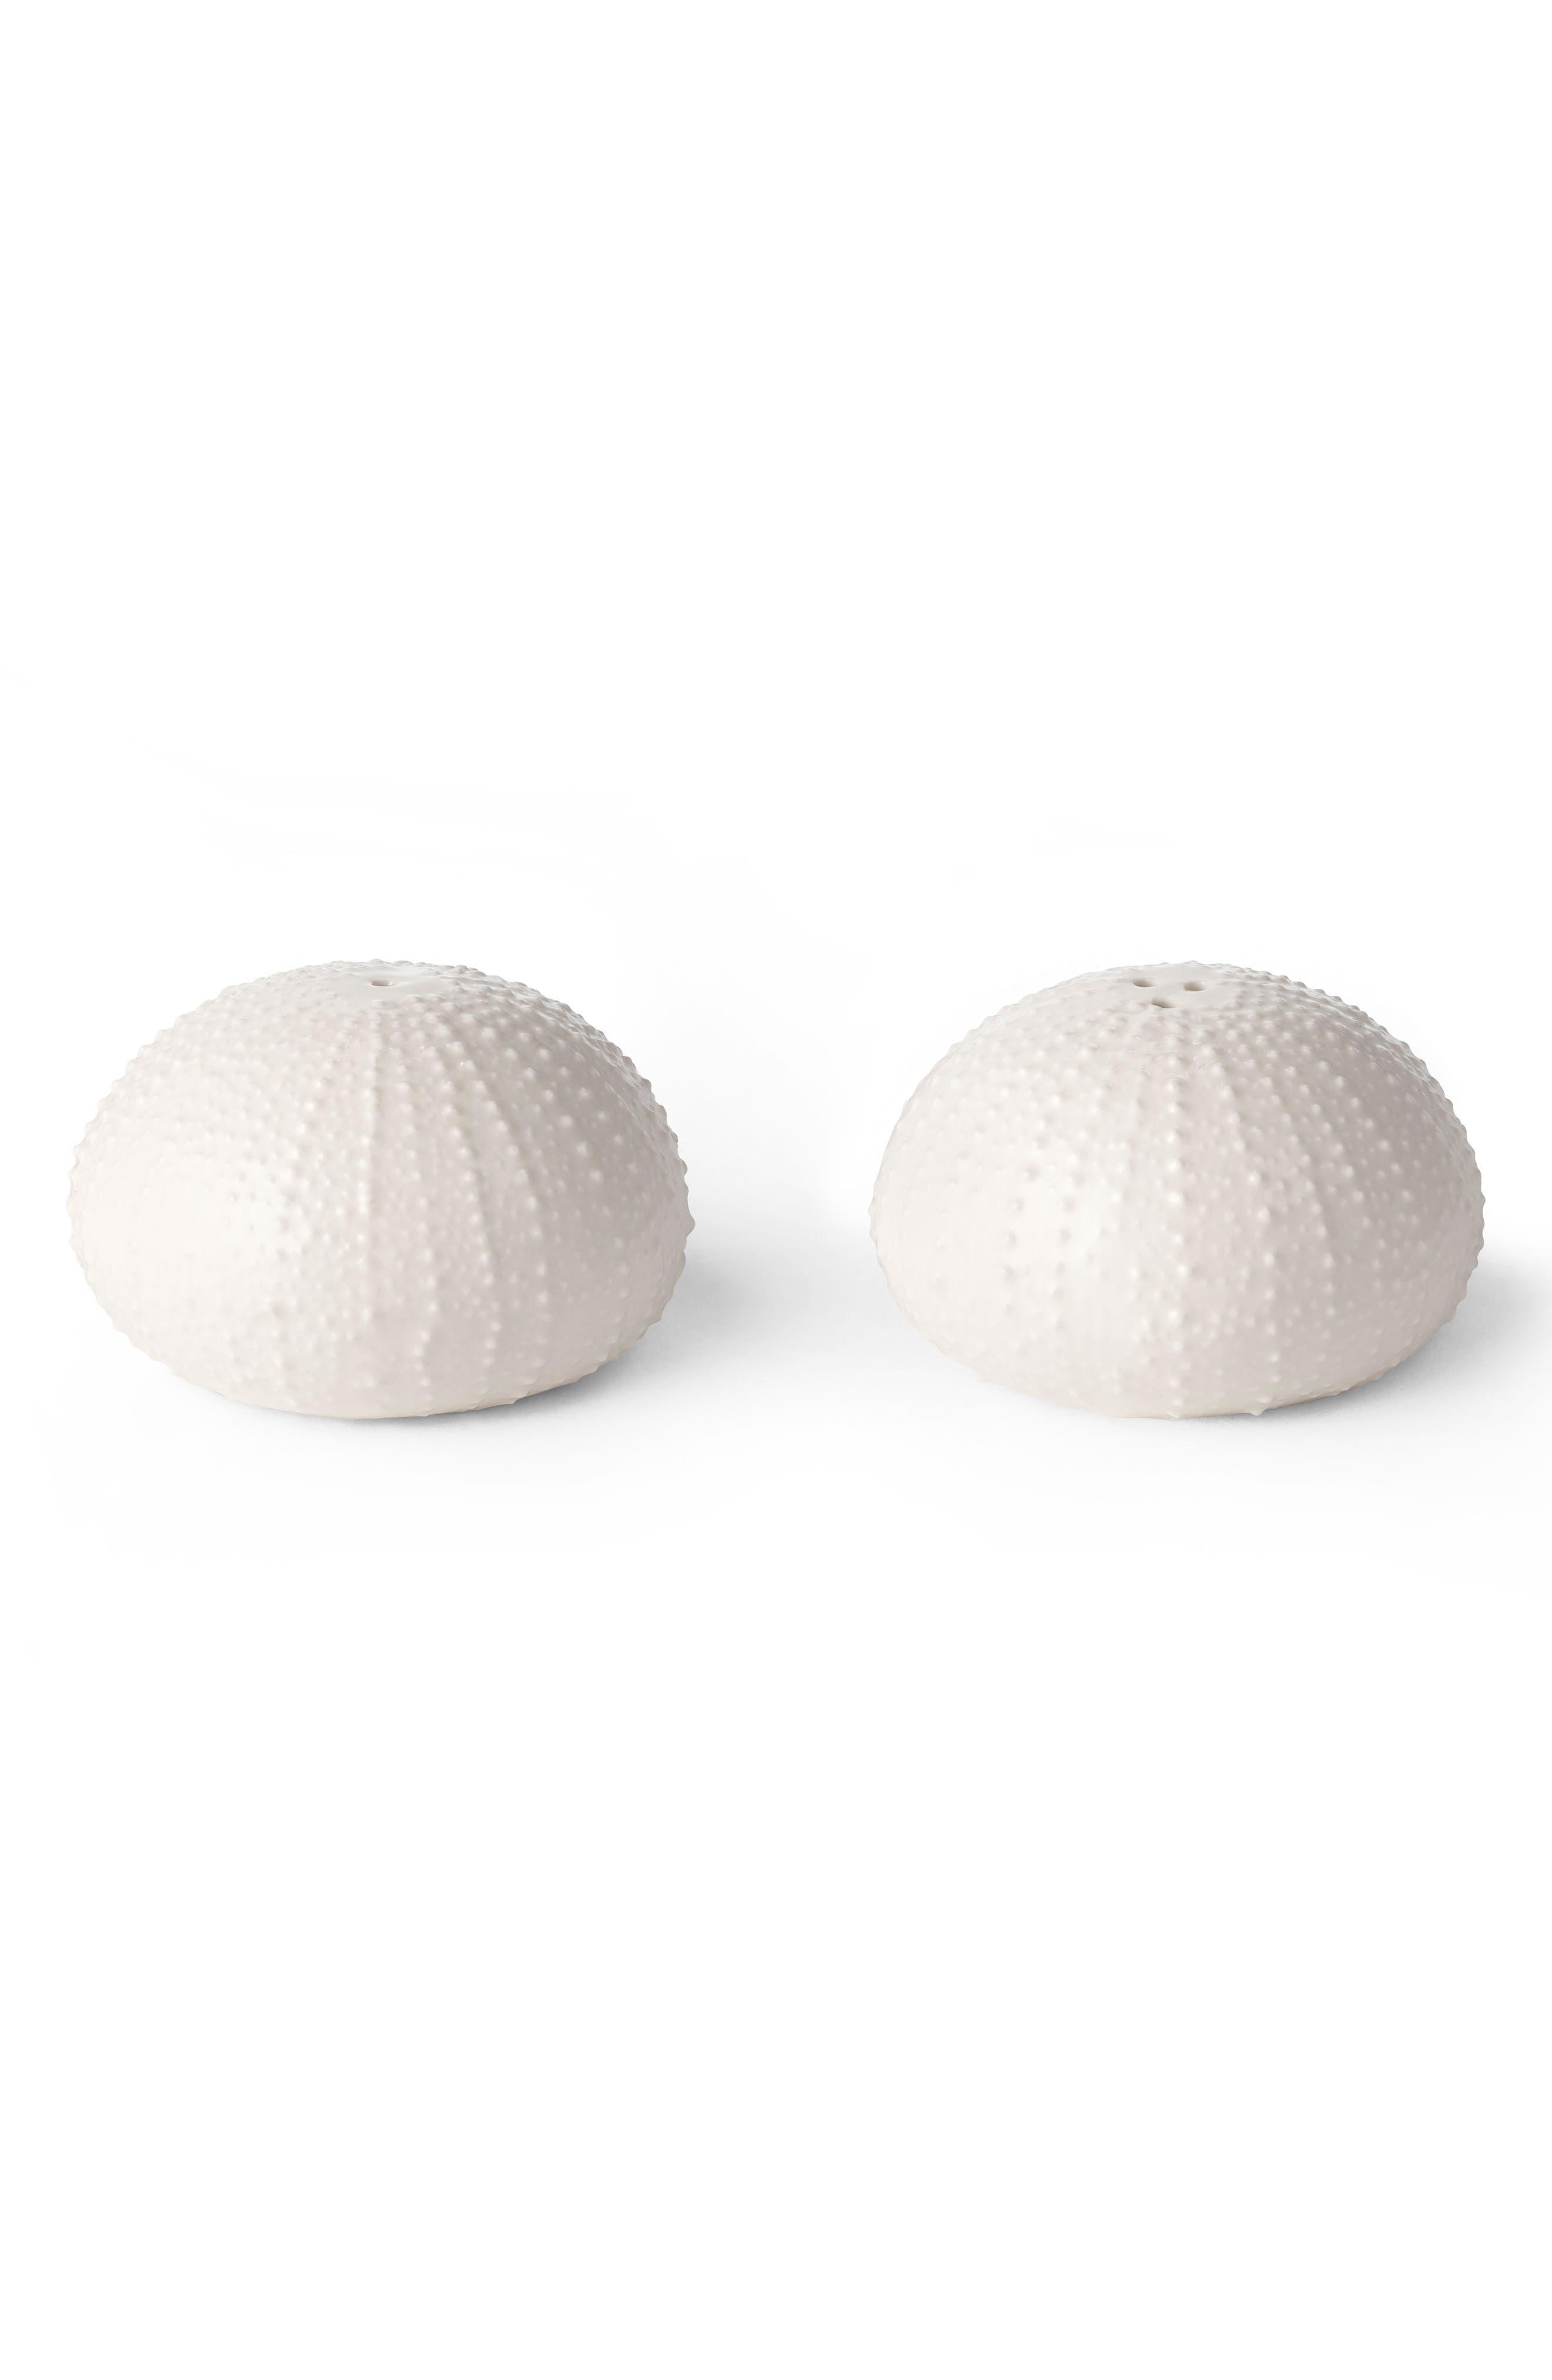 Sea Urchin Salt & Pepper Shakers,                             Main thumbnail 1, color,                             WHITE